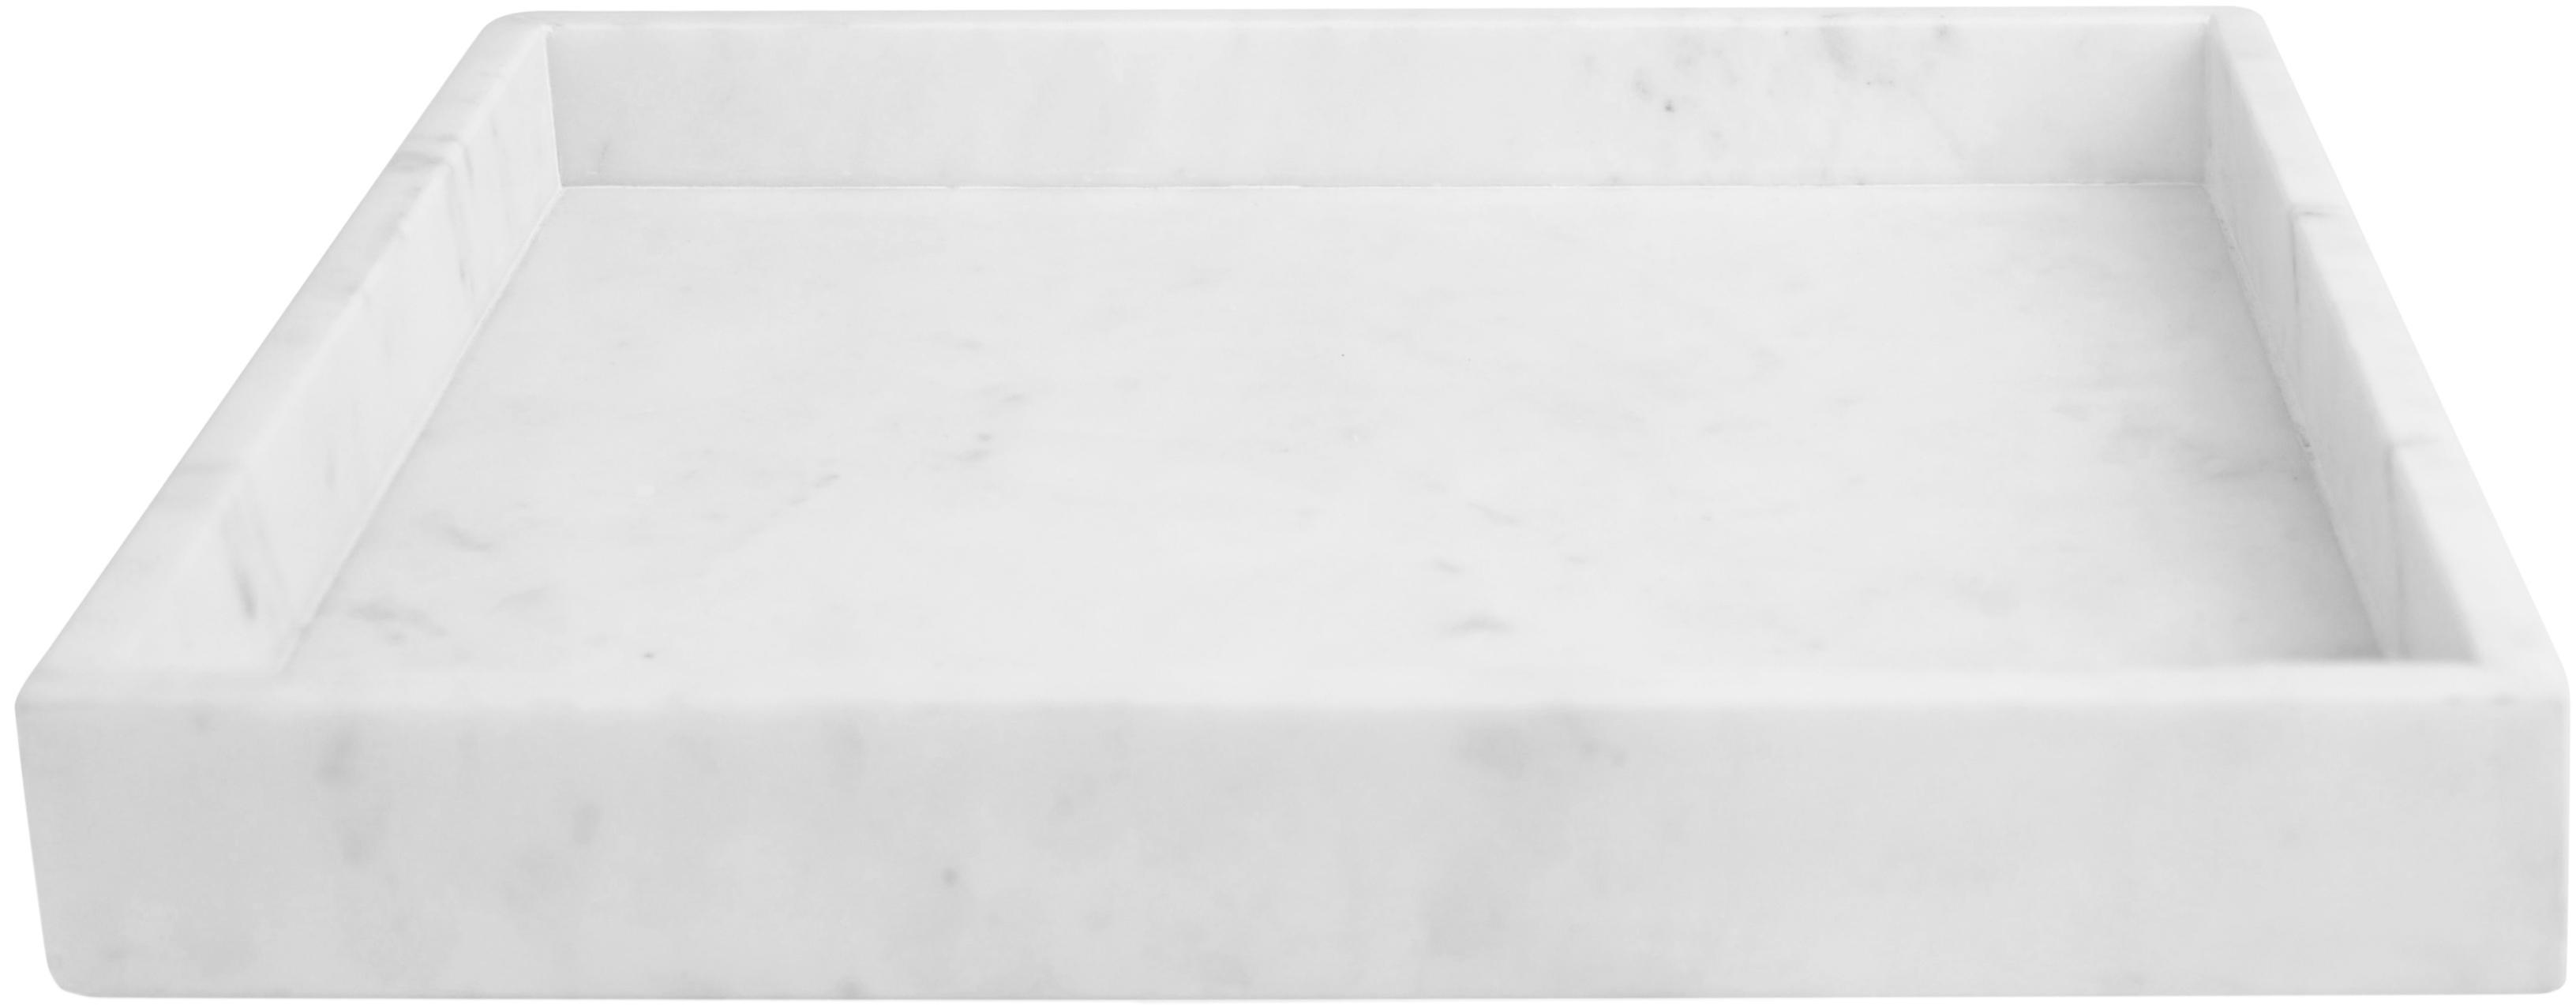 Decoratief marmeren dienblad Ciaran, Marmer, Gemarmerd wit, B 30 x D 30 cm